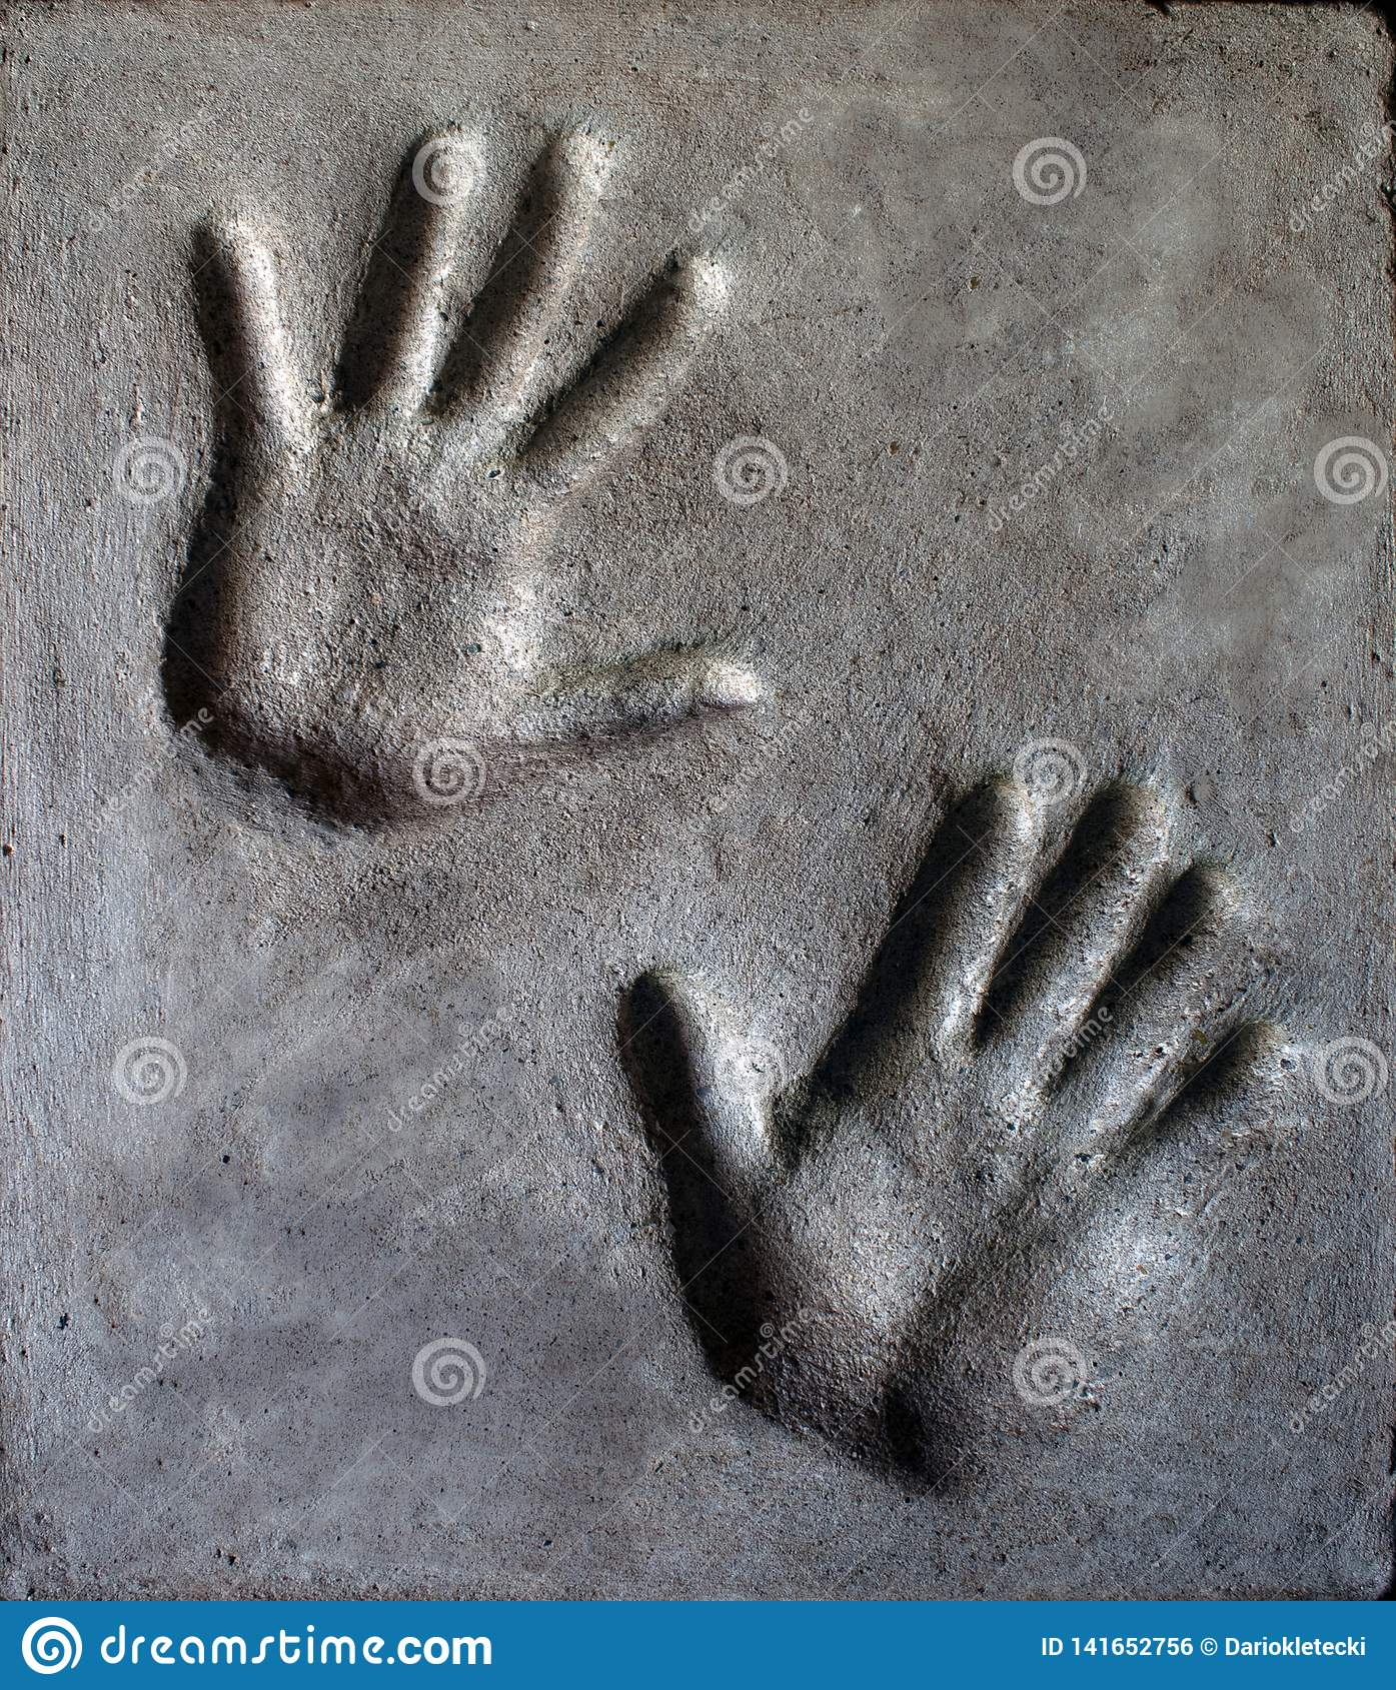 Hand imprint in mortar.